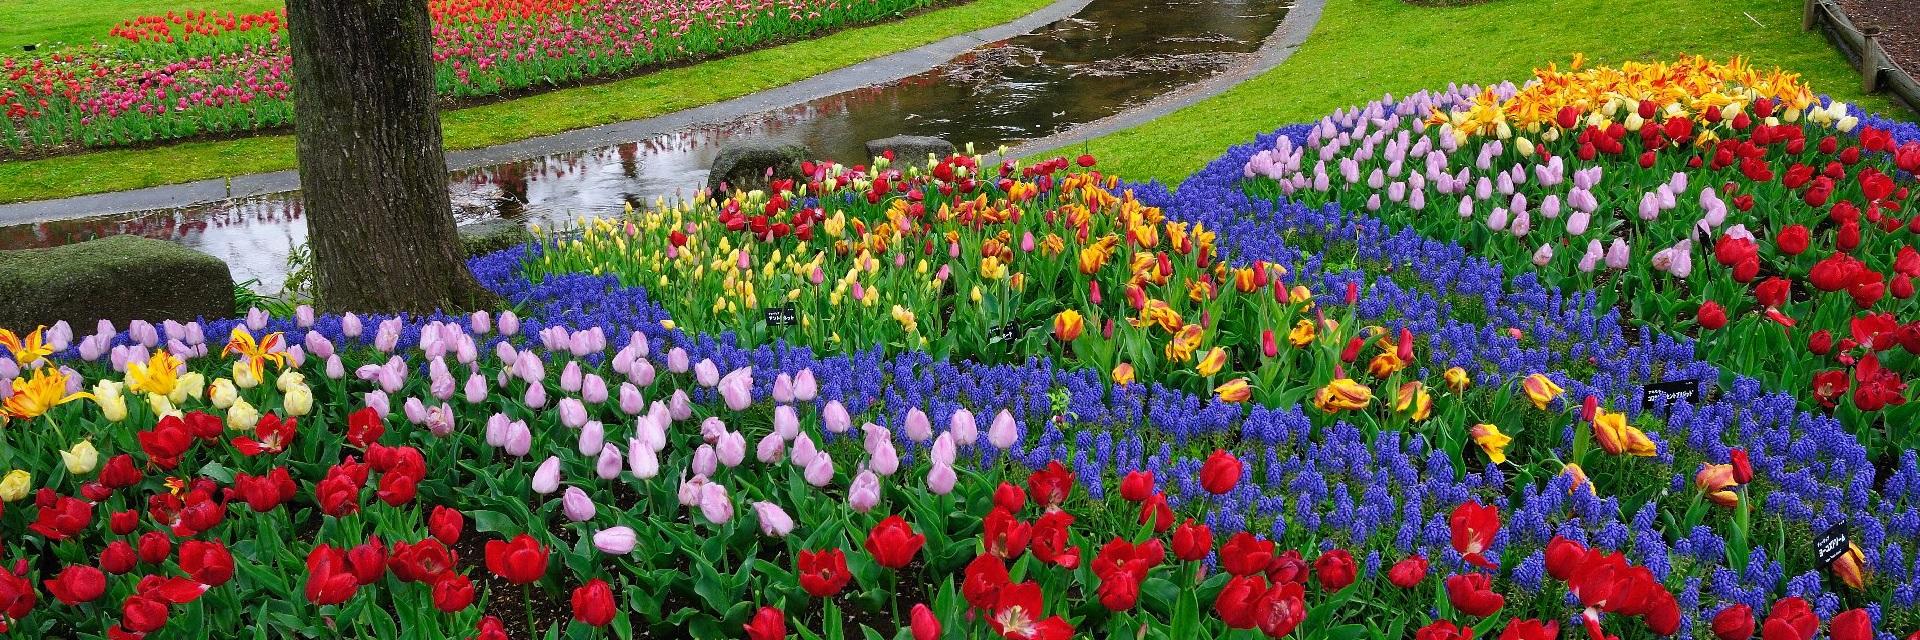 Perlu Bunga Di Bandung Yuk Ke 8 Taman Bunga Dan Florist Ini